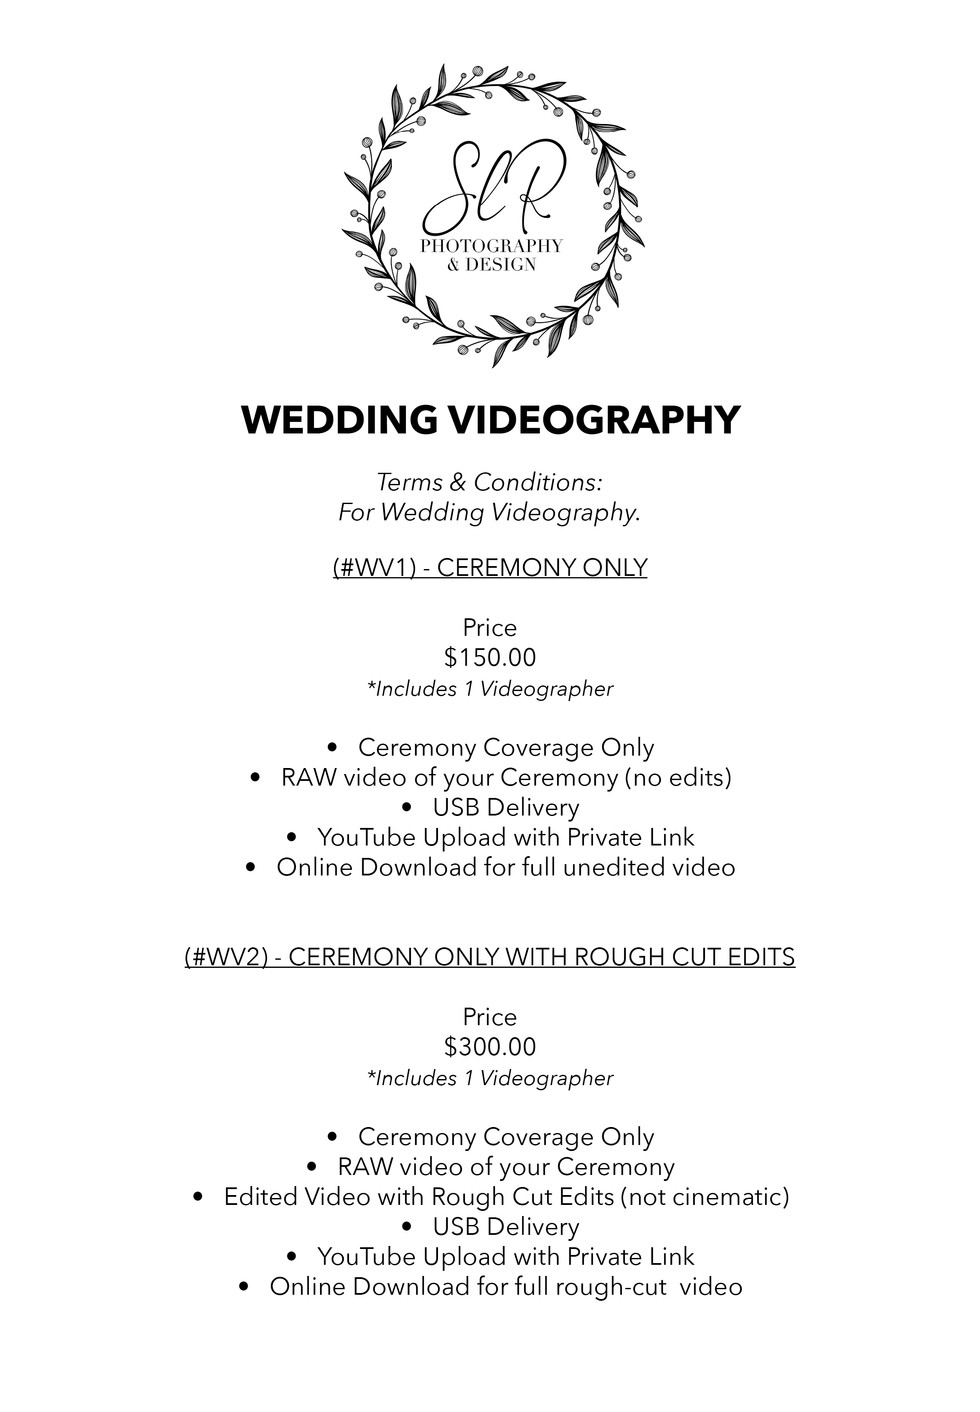 SLR Photography & Design price sheet -11